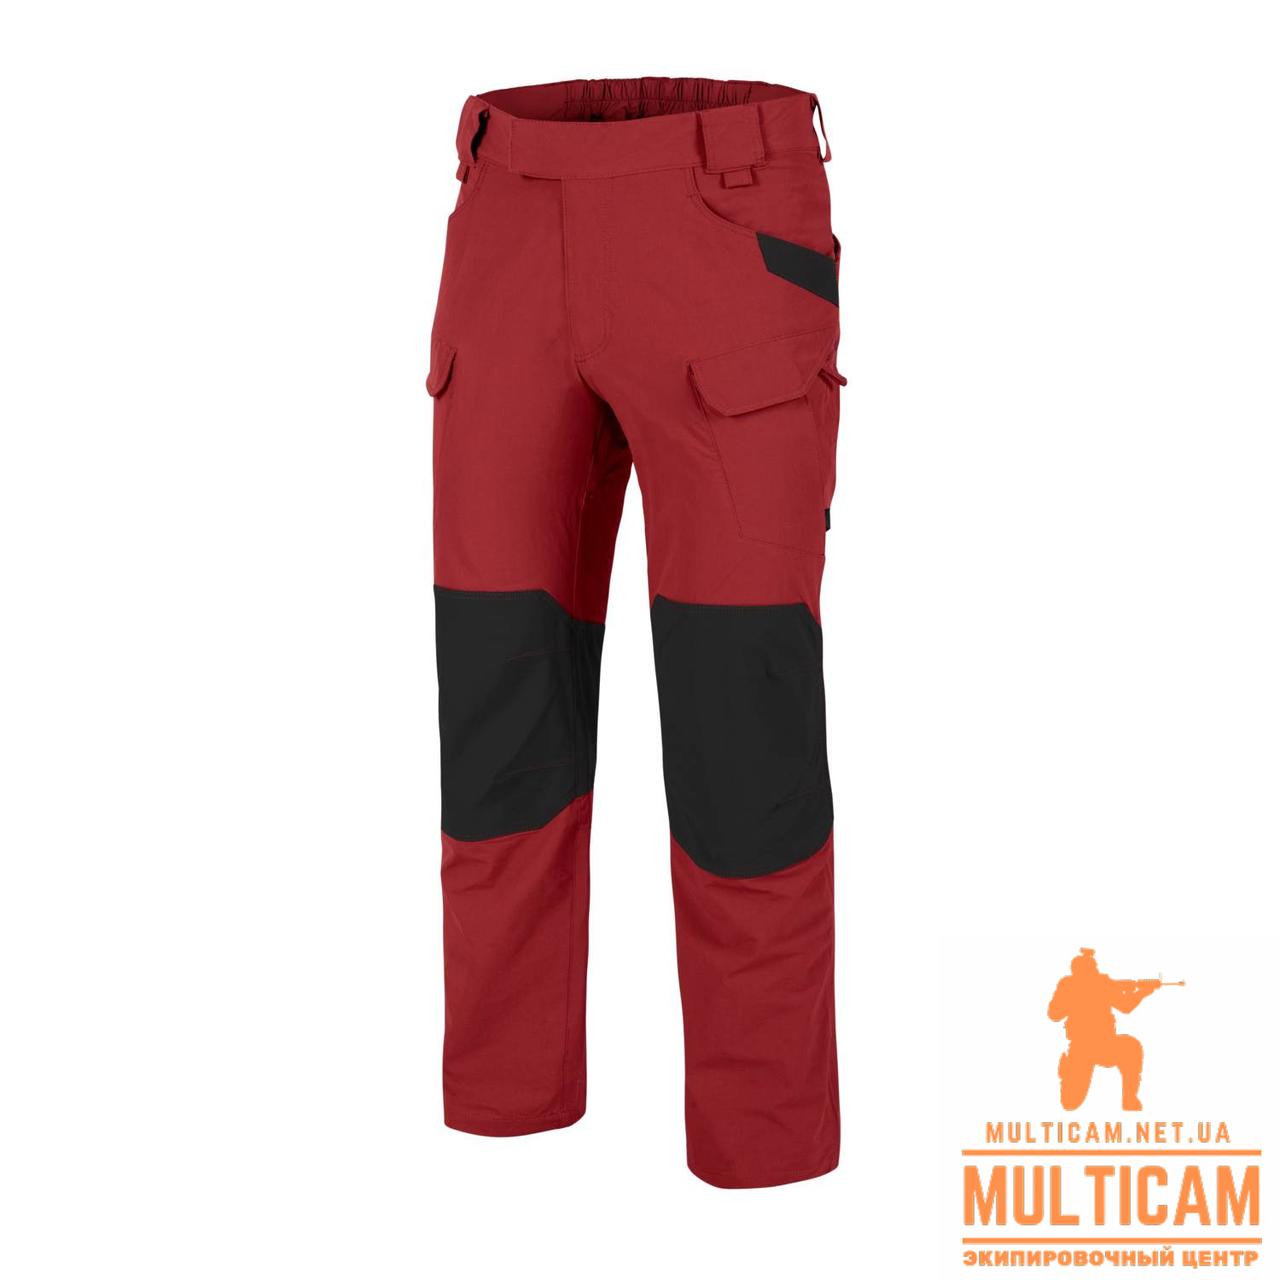 Брюки Helikon-Tex® OTP (Outdoor Pants)® - VersaStretch® - Crimson Sky/Black